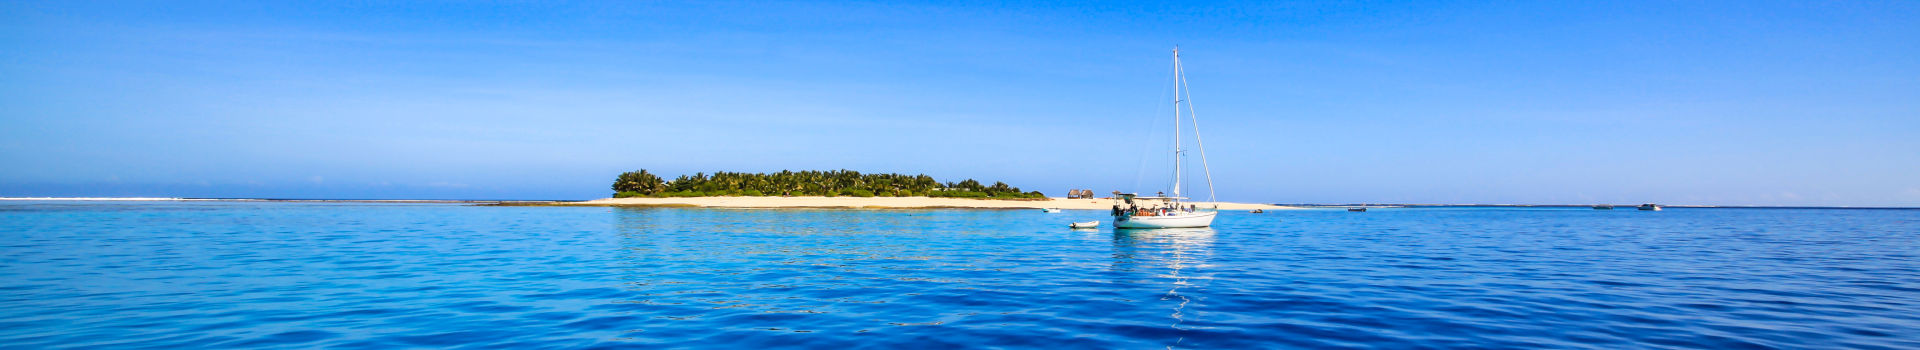 Redseason - Holidays - Boat and beautiful Fiji atoll island with white beach